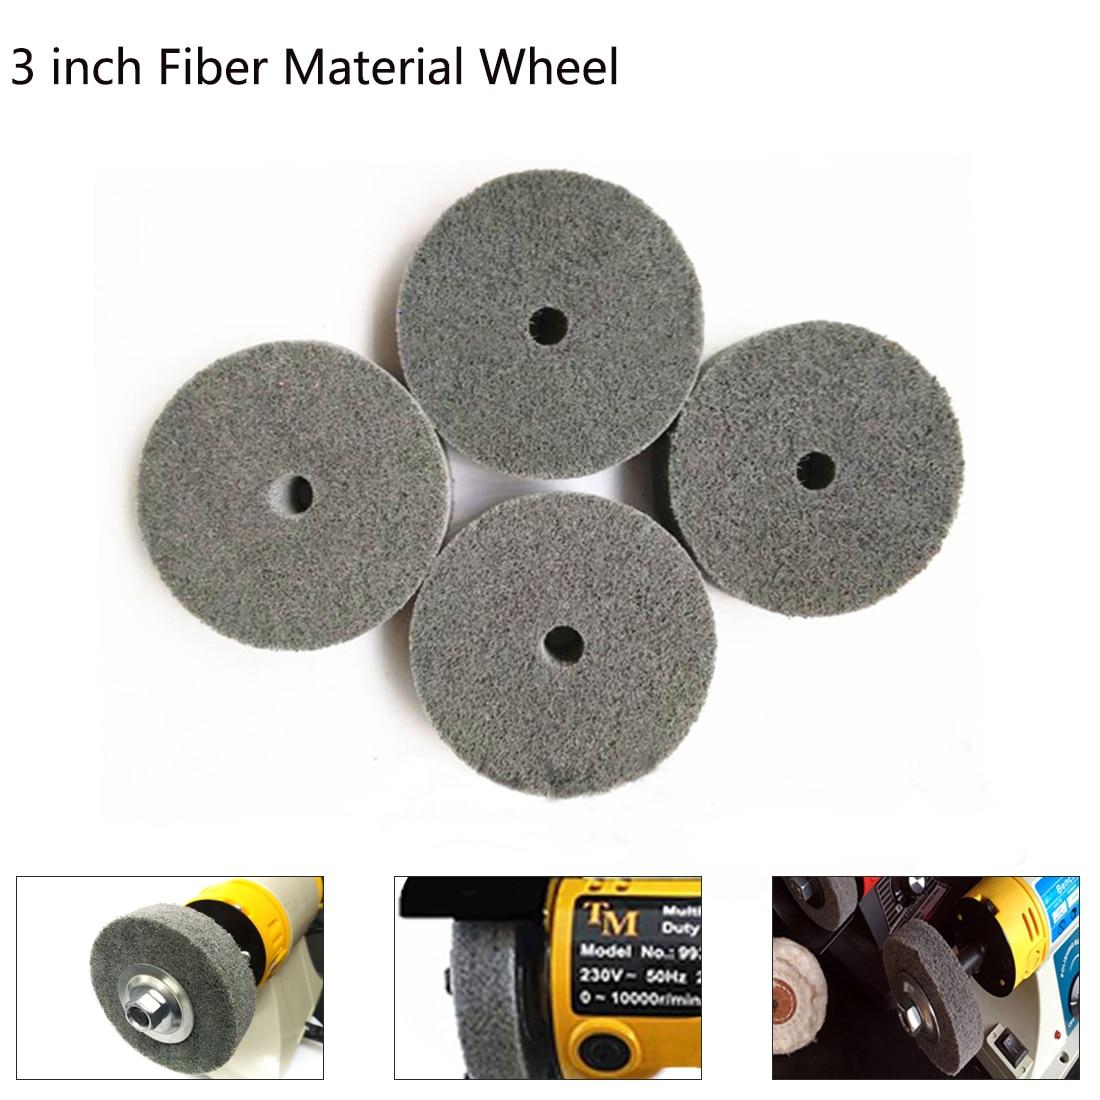 Efficient And Durable Metal Cutting Woodworking 3 Inch Nylon Wheel Fiber Wheel Felt Wheel Polishing Woodworking Tools Necessary